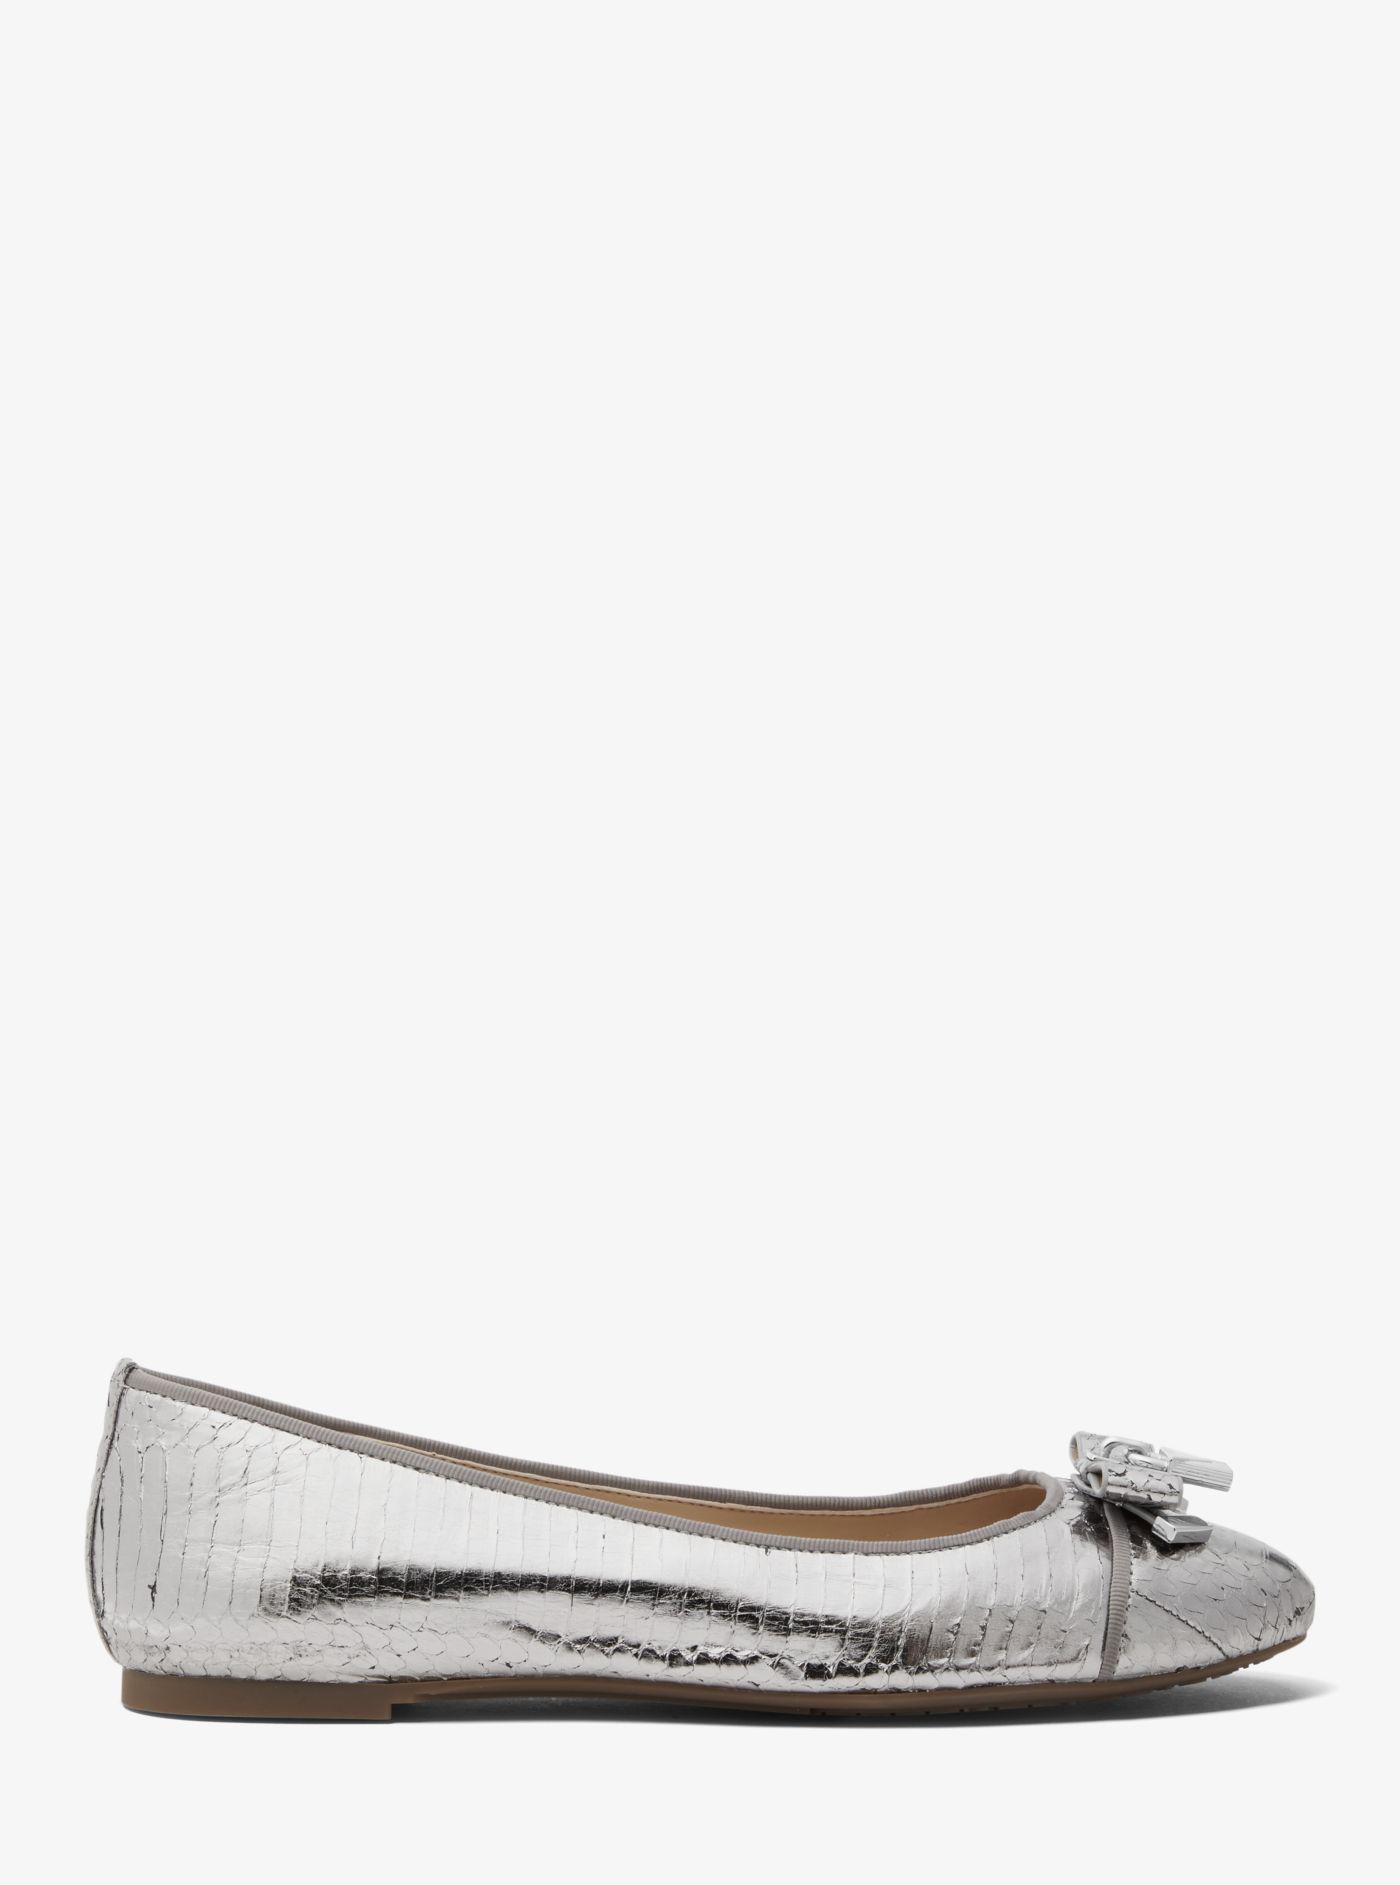 42cda57fe350e Michael Kors Alice Metallic Snakeskin Ballet Flat in Metallic - Lyst